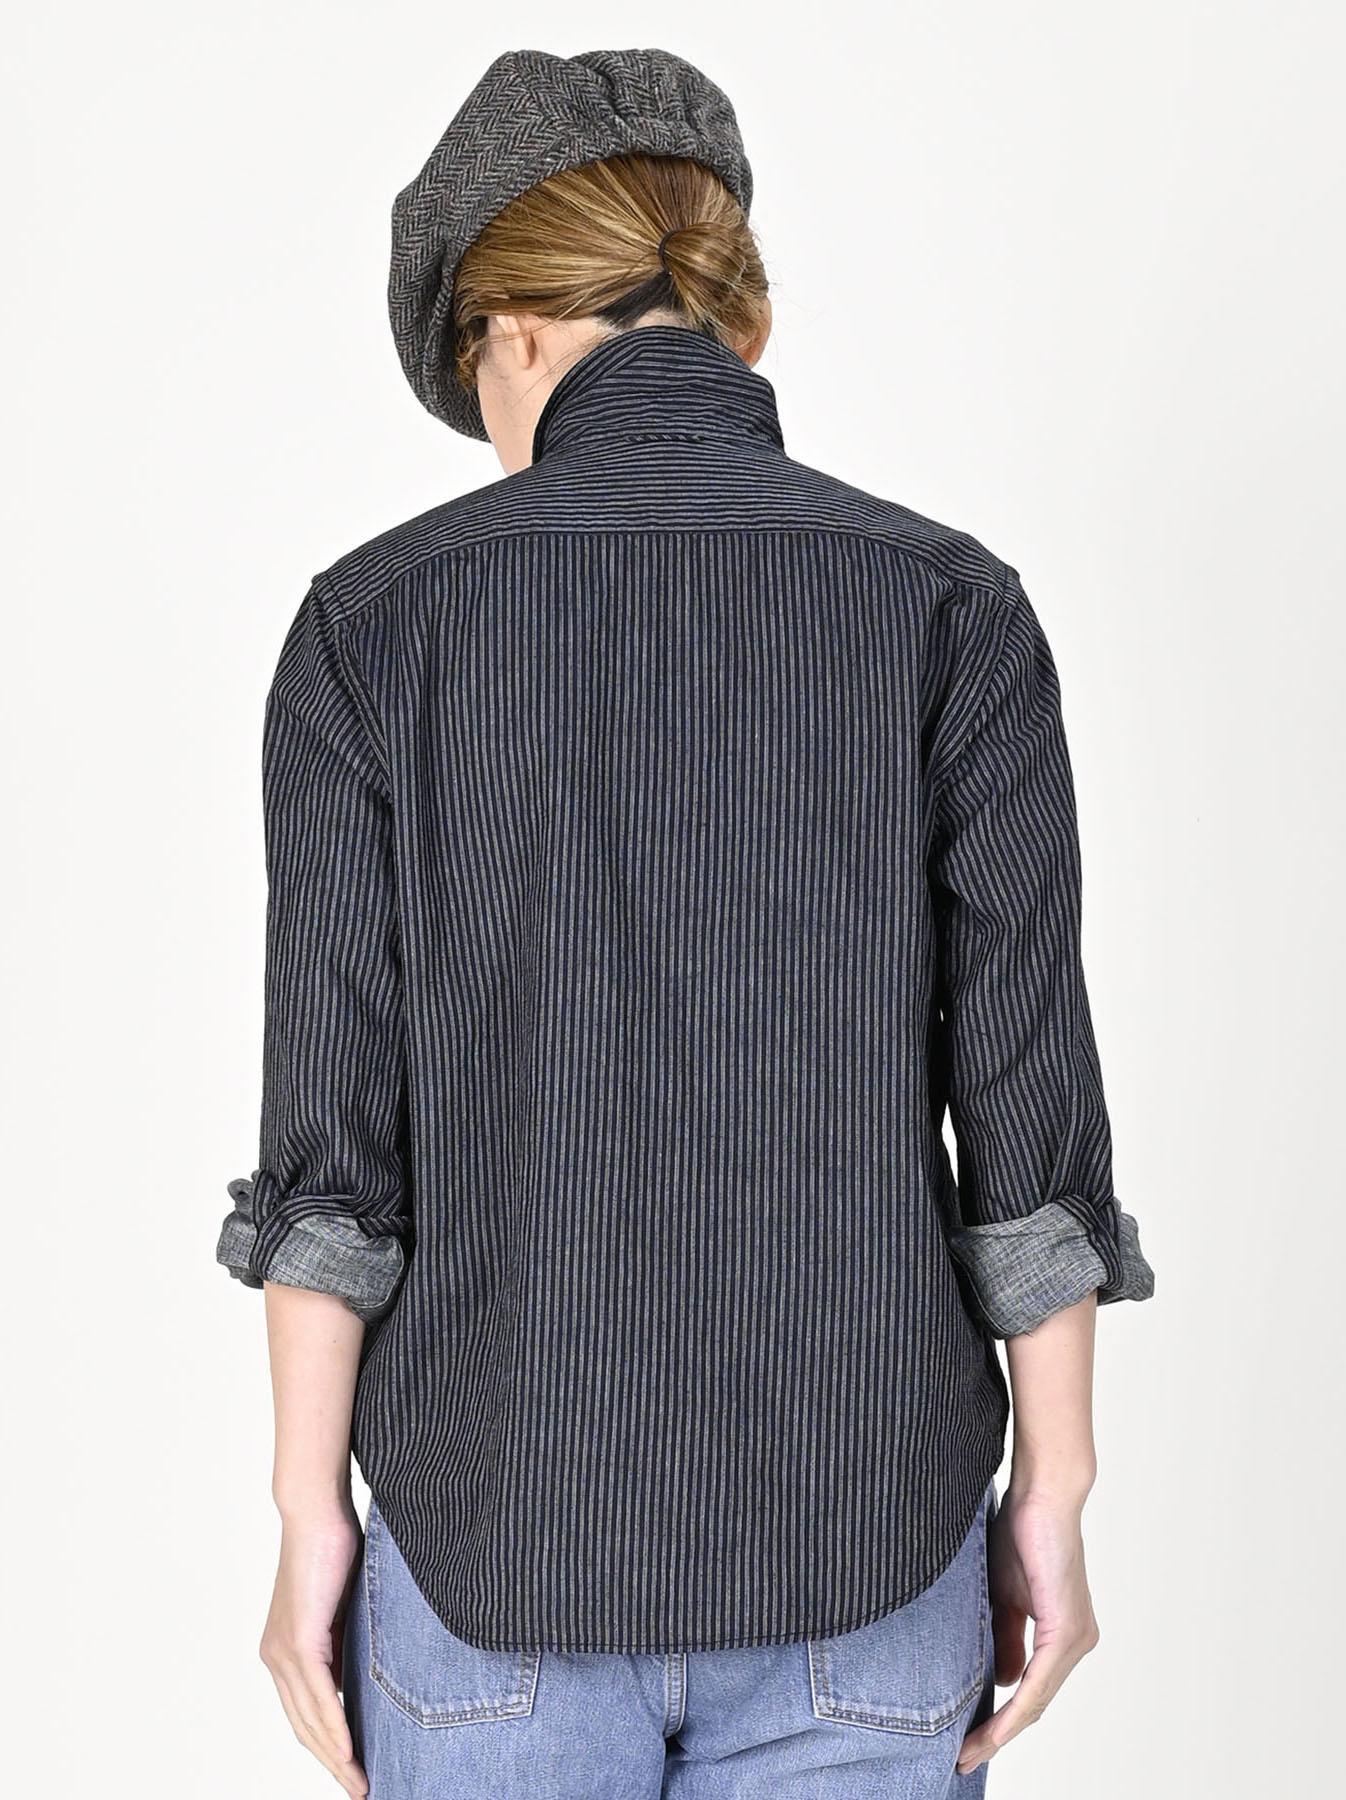 Indigo Double Cloth 908 Regular Shirt-9